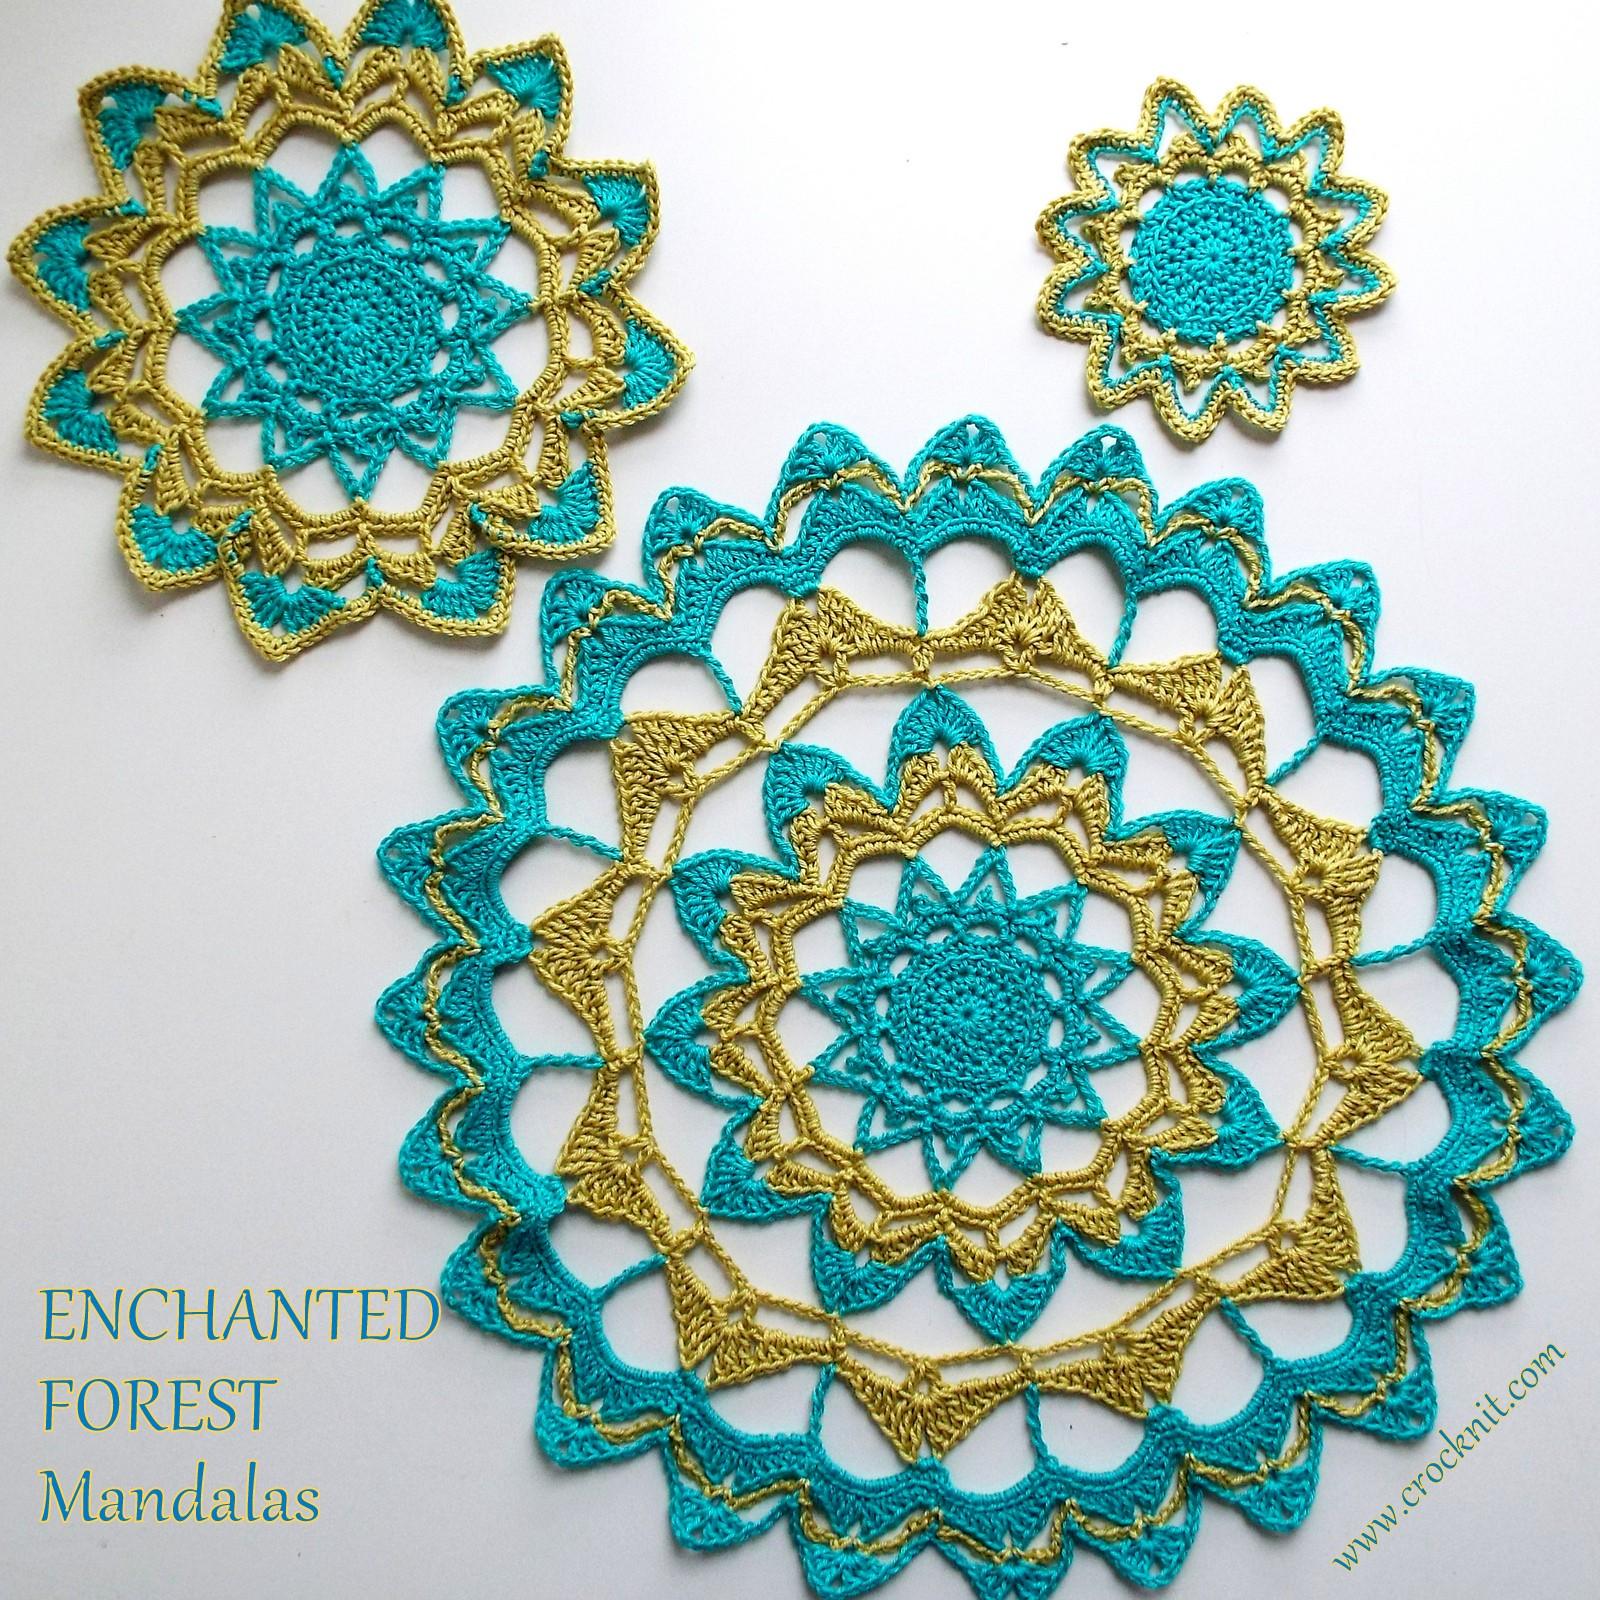 Microcknit Creations Enchanted Forest Mandalas